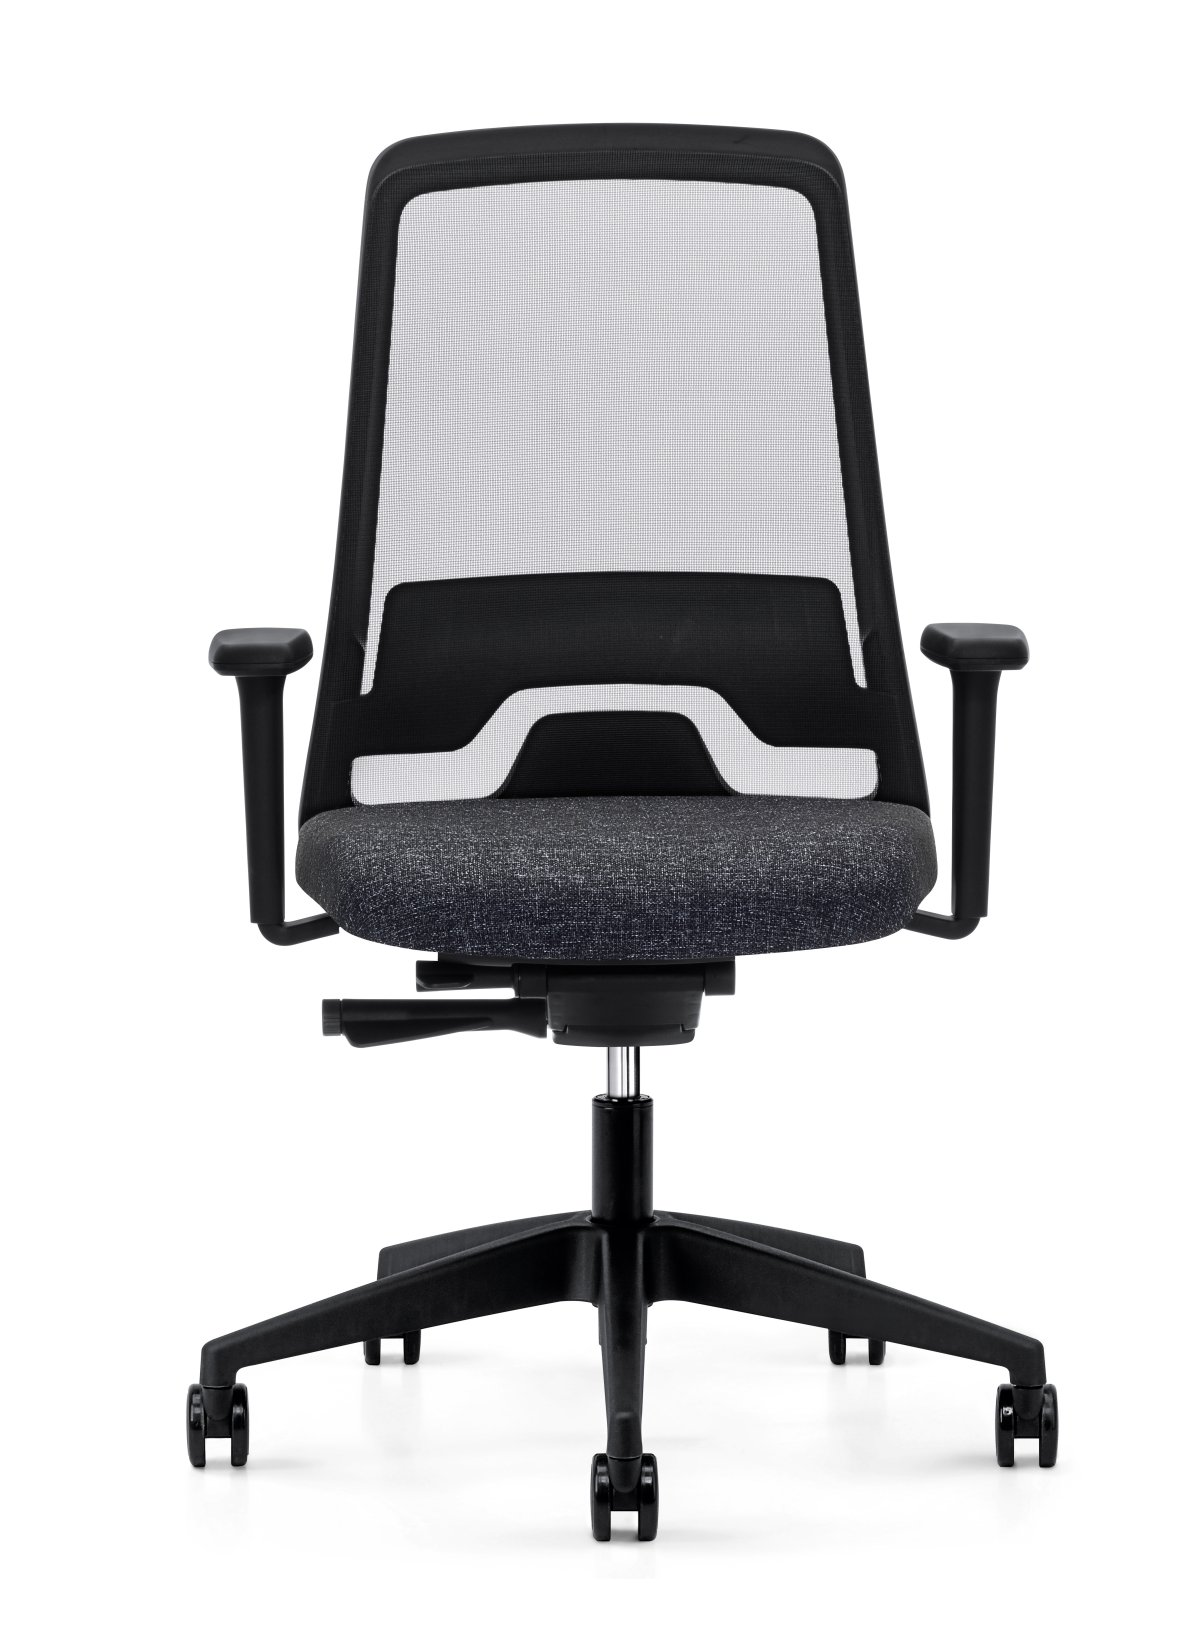 staples task chair canada church accessories every 172e series by interstuhl ergocanada